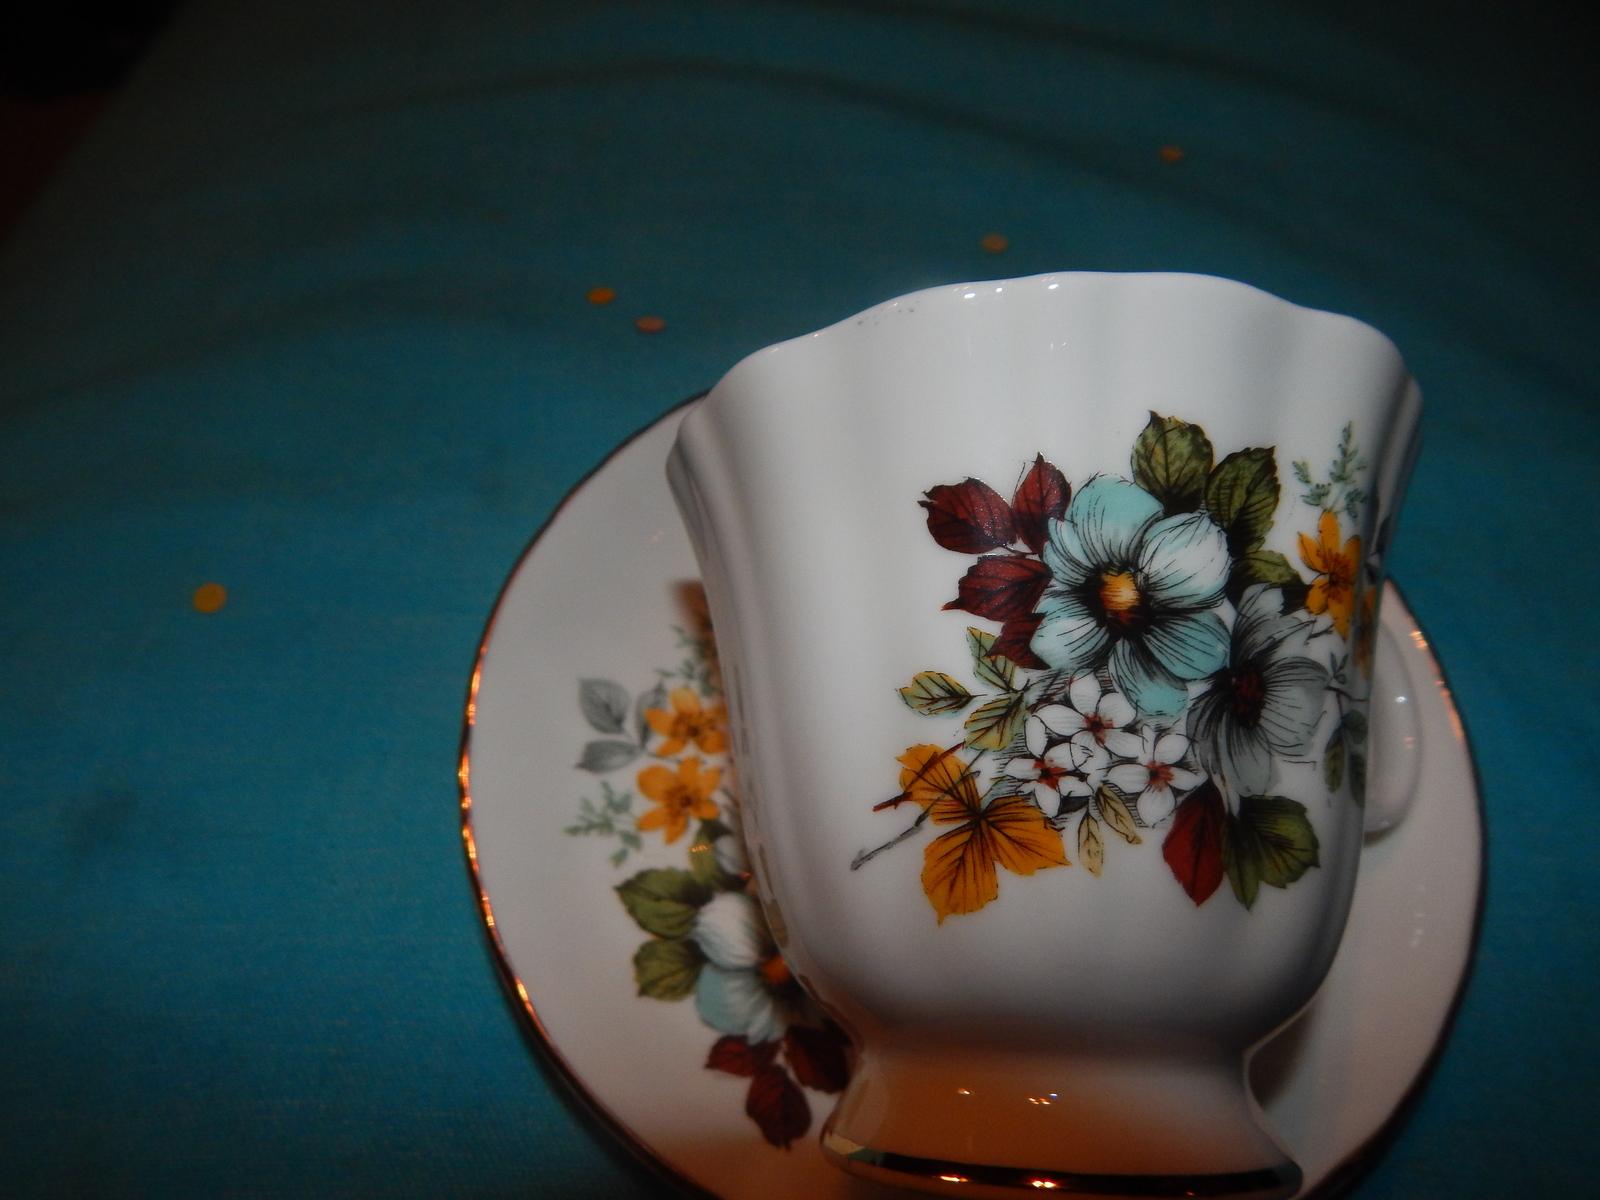 Royal Grafton cup and saucer bone china England Free Shipping #131